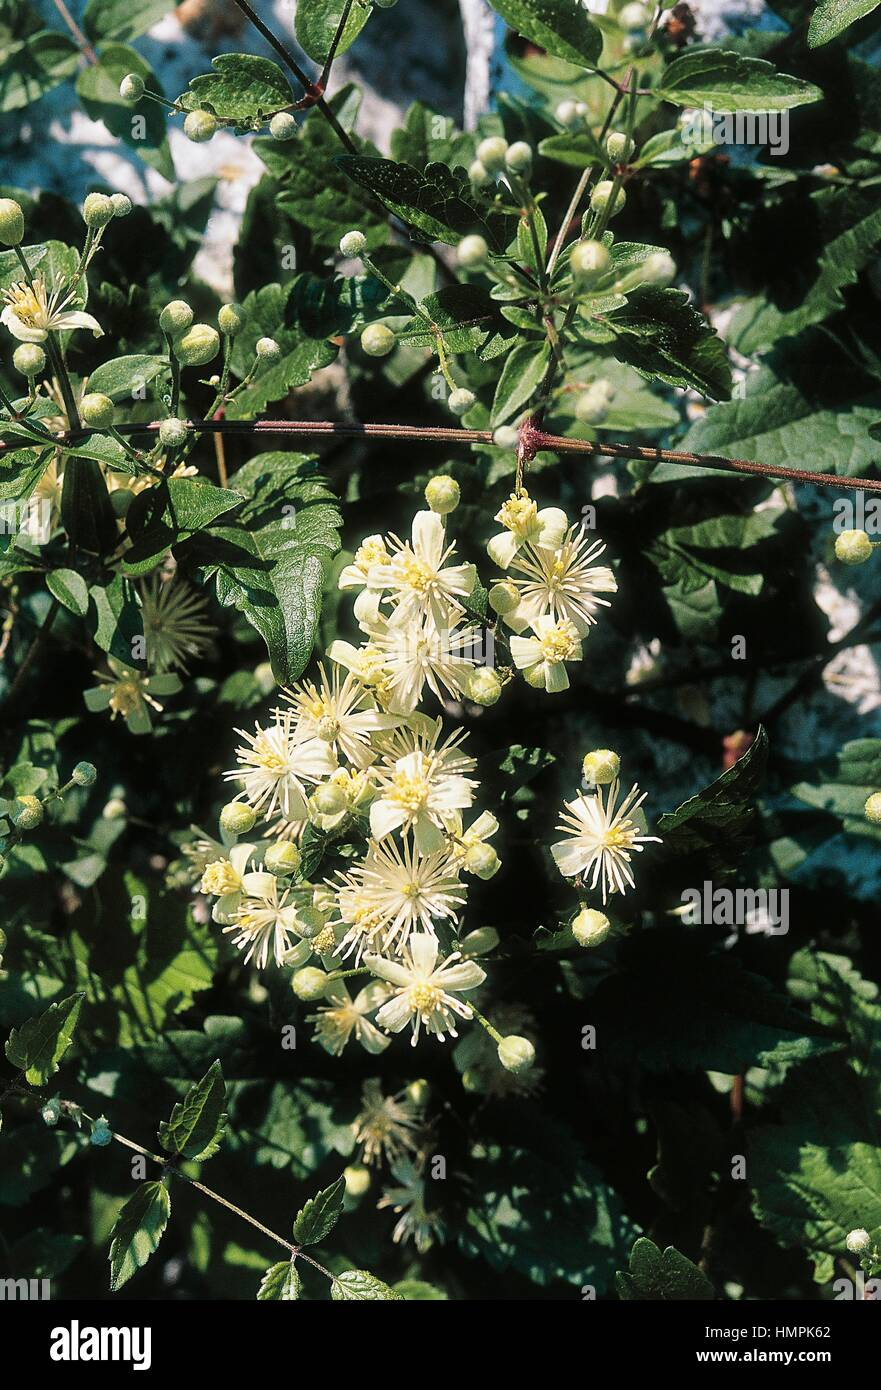 Old man's beard or Traveller's joy (Clematis vitalba), Ranunculaceae. - Stock Image